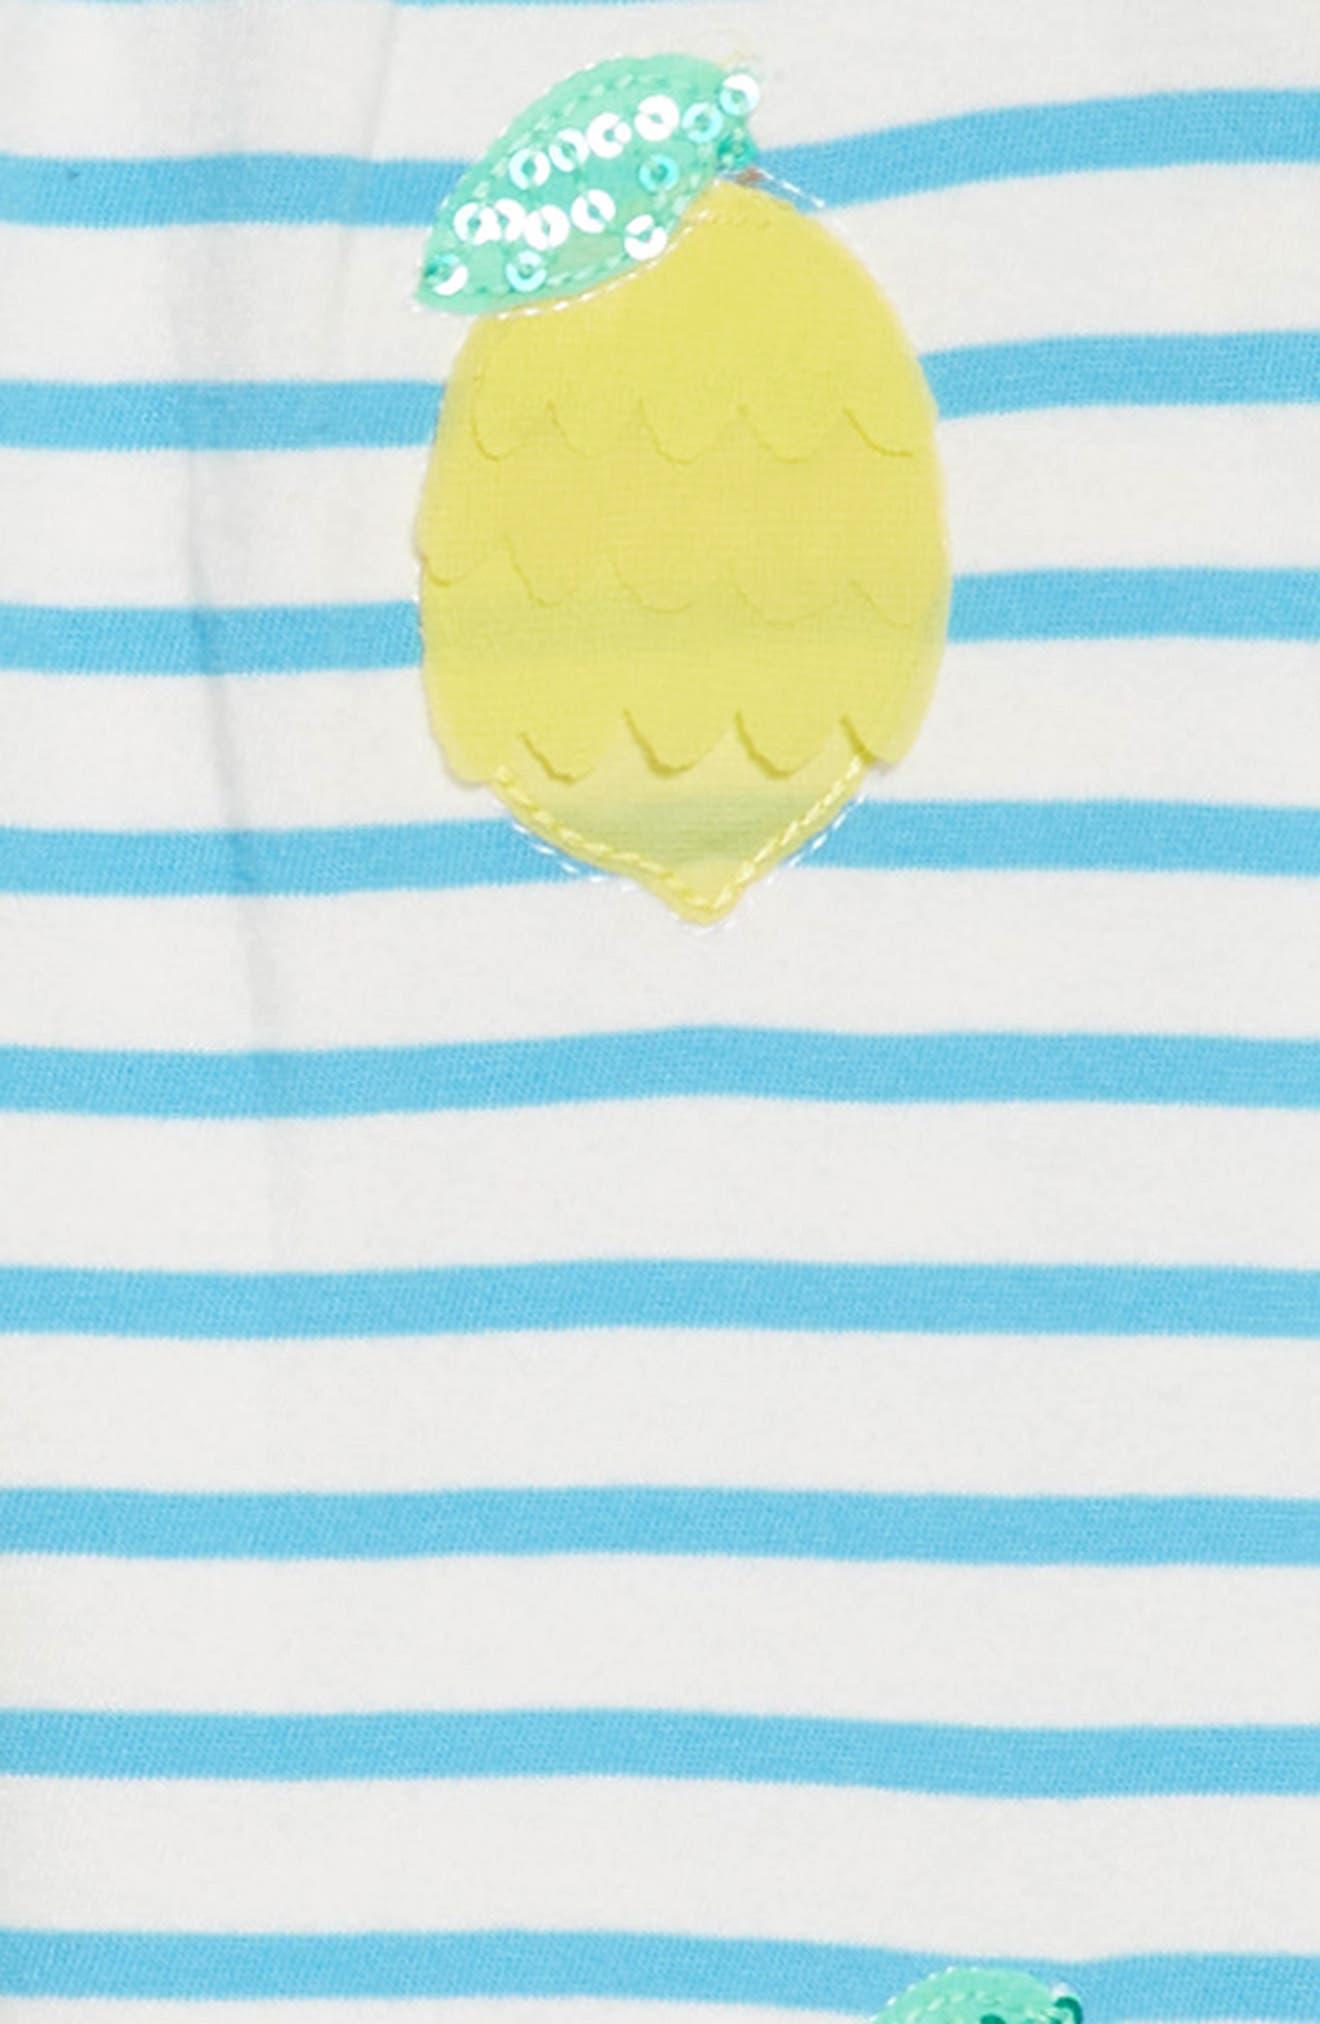 Jersey Sequin Sundress,                             Alternate thumbnail 3, color,                             Ivory/ Penzance Blue Nav